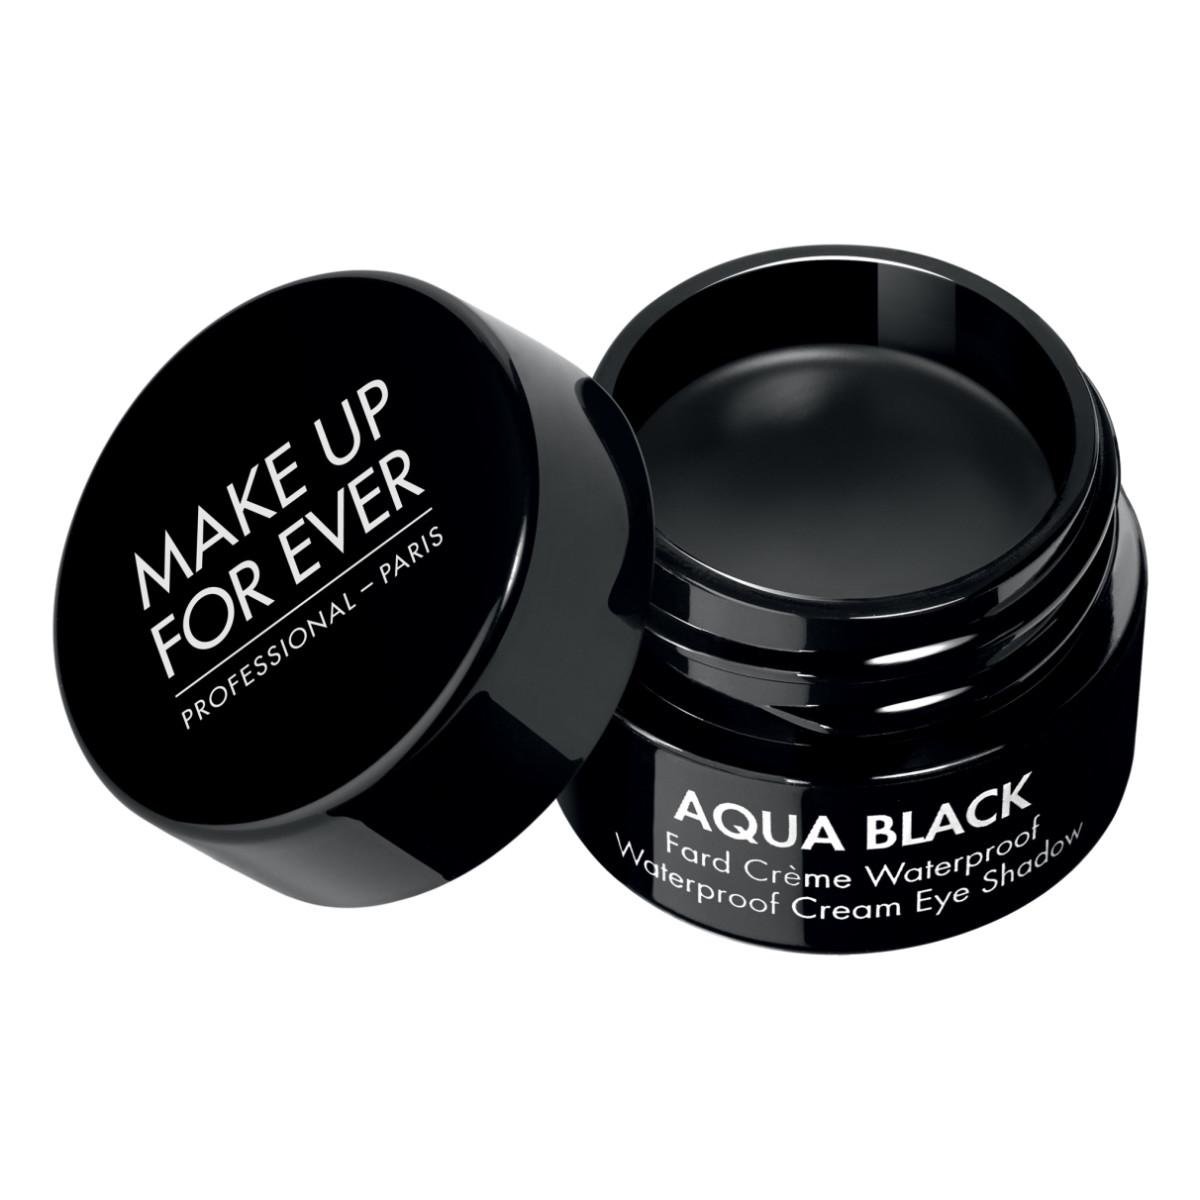 Make Up For Ever Aqua Black Waterproof Cream Eye Shadow